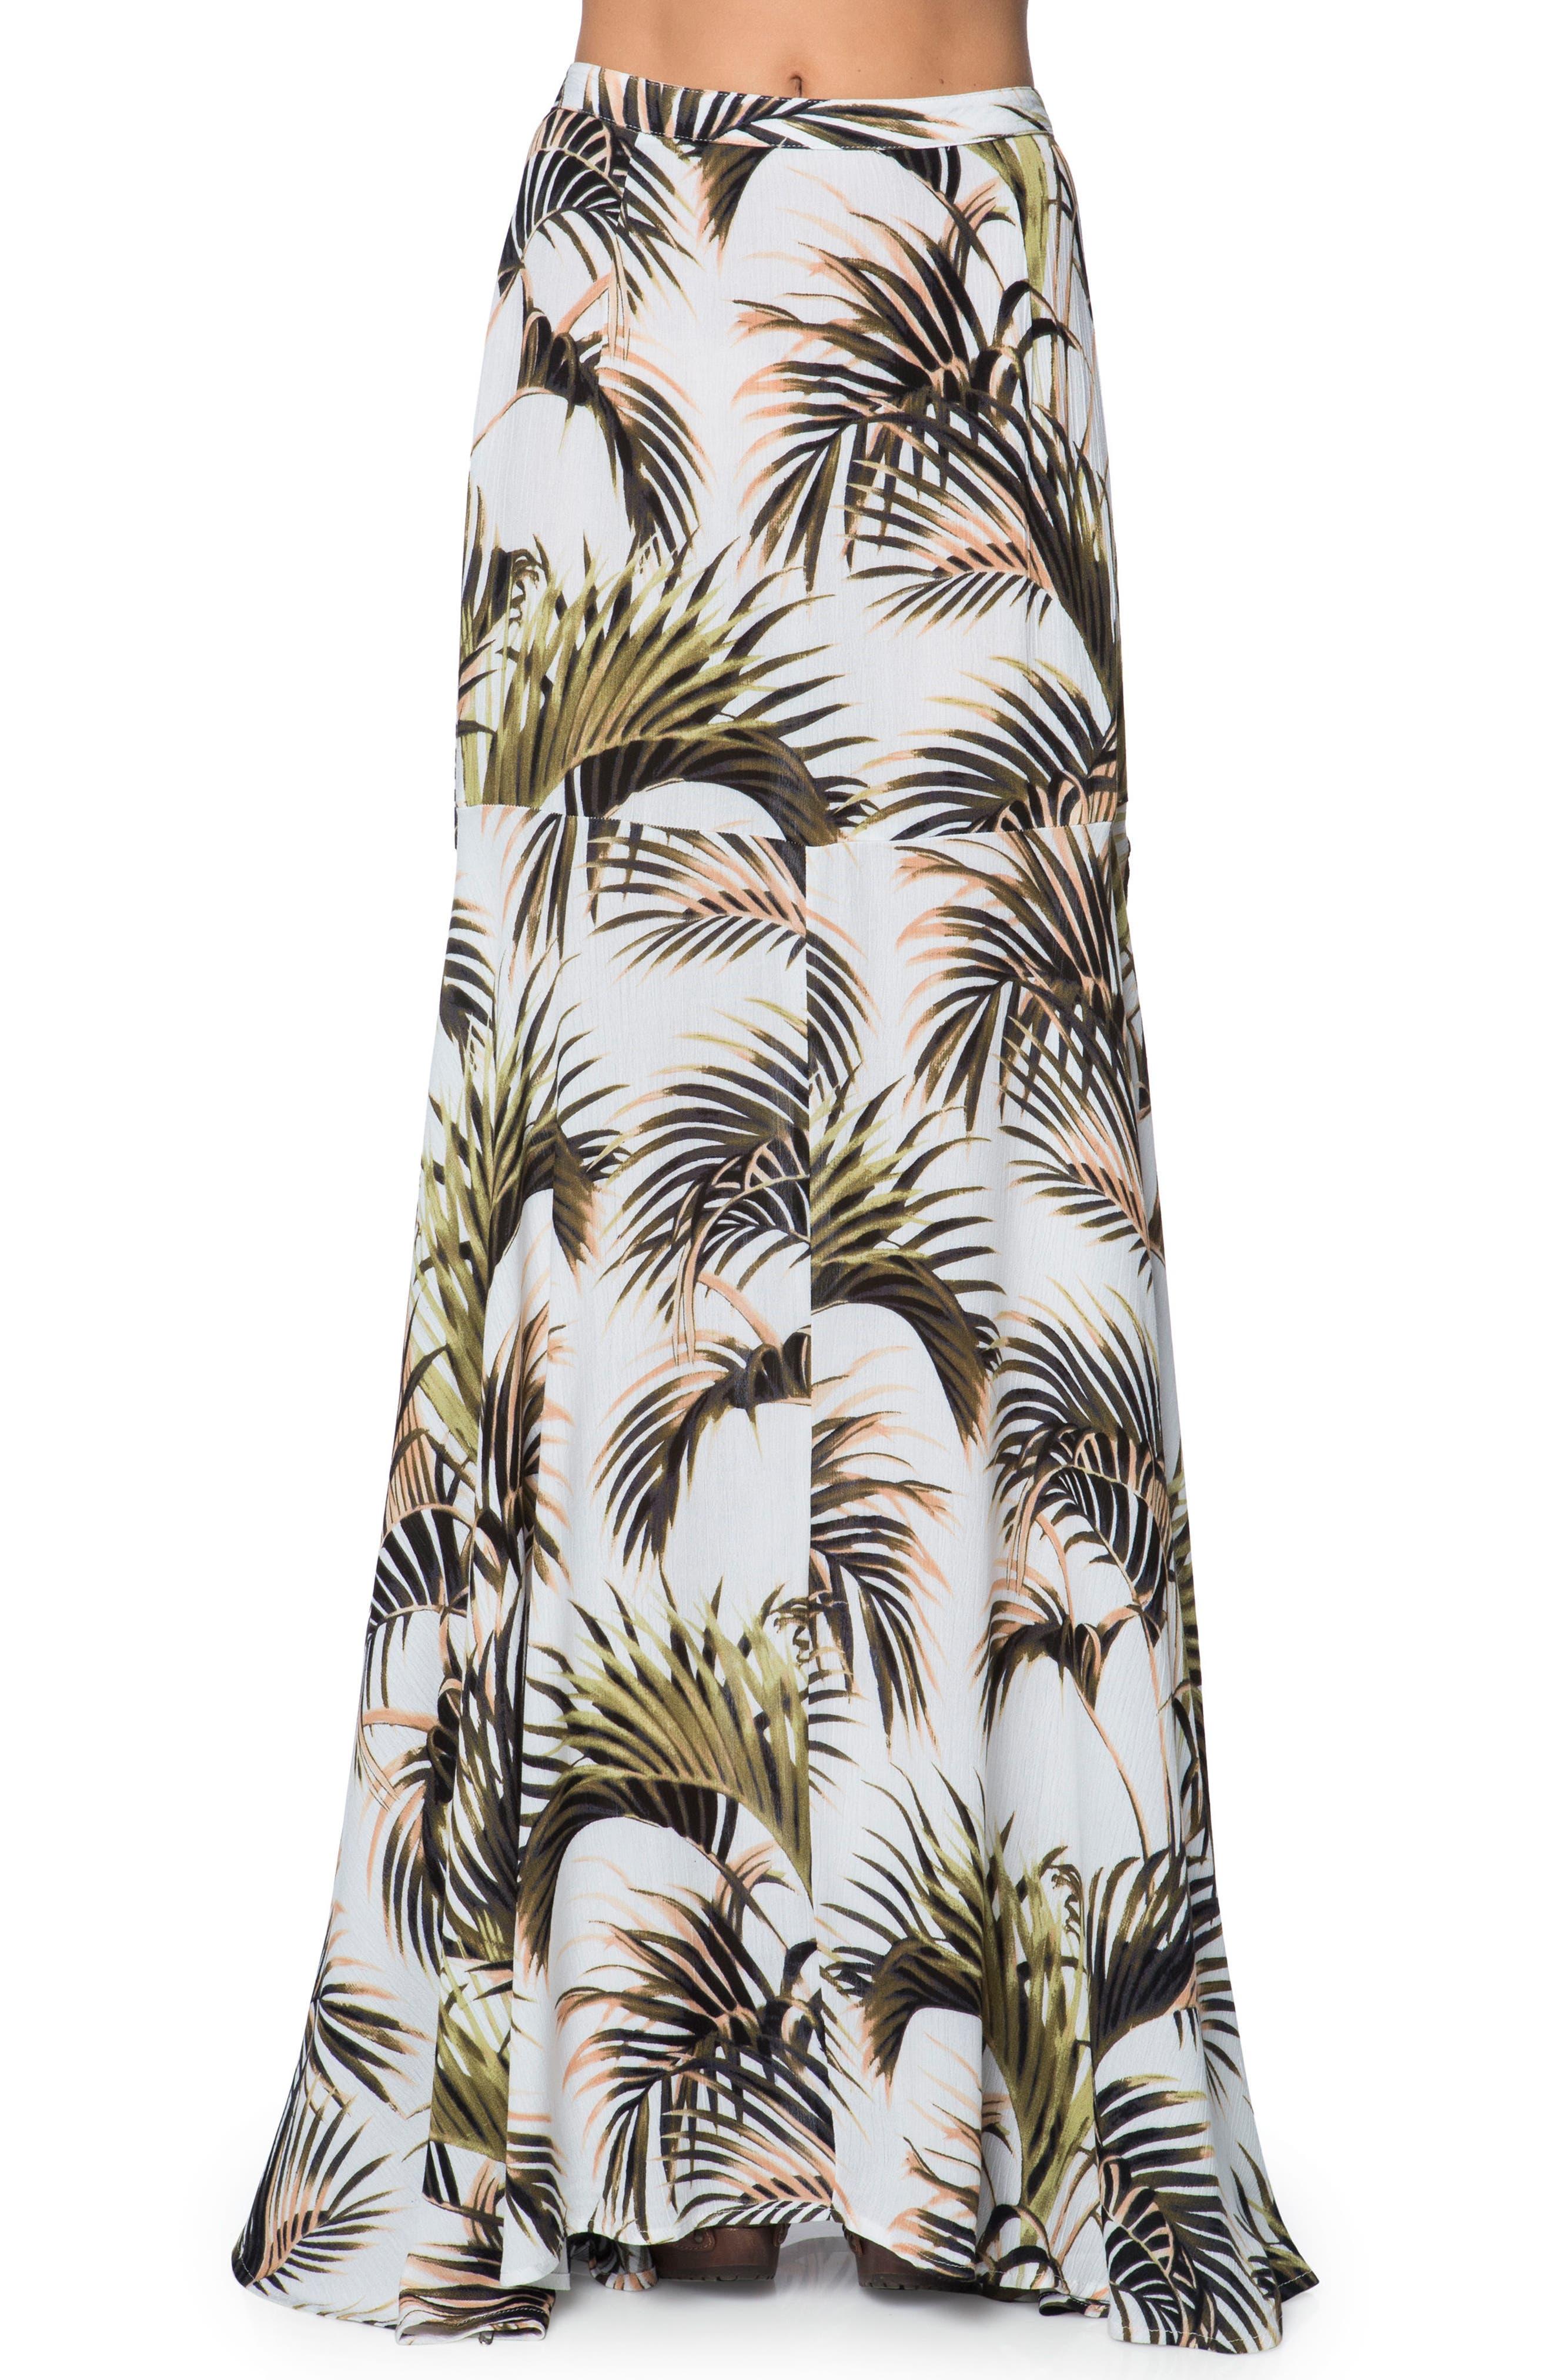 O'Neill Nosara Slit Maxi Skirt